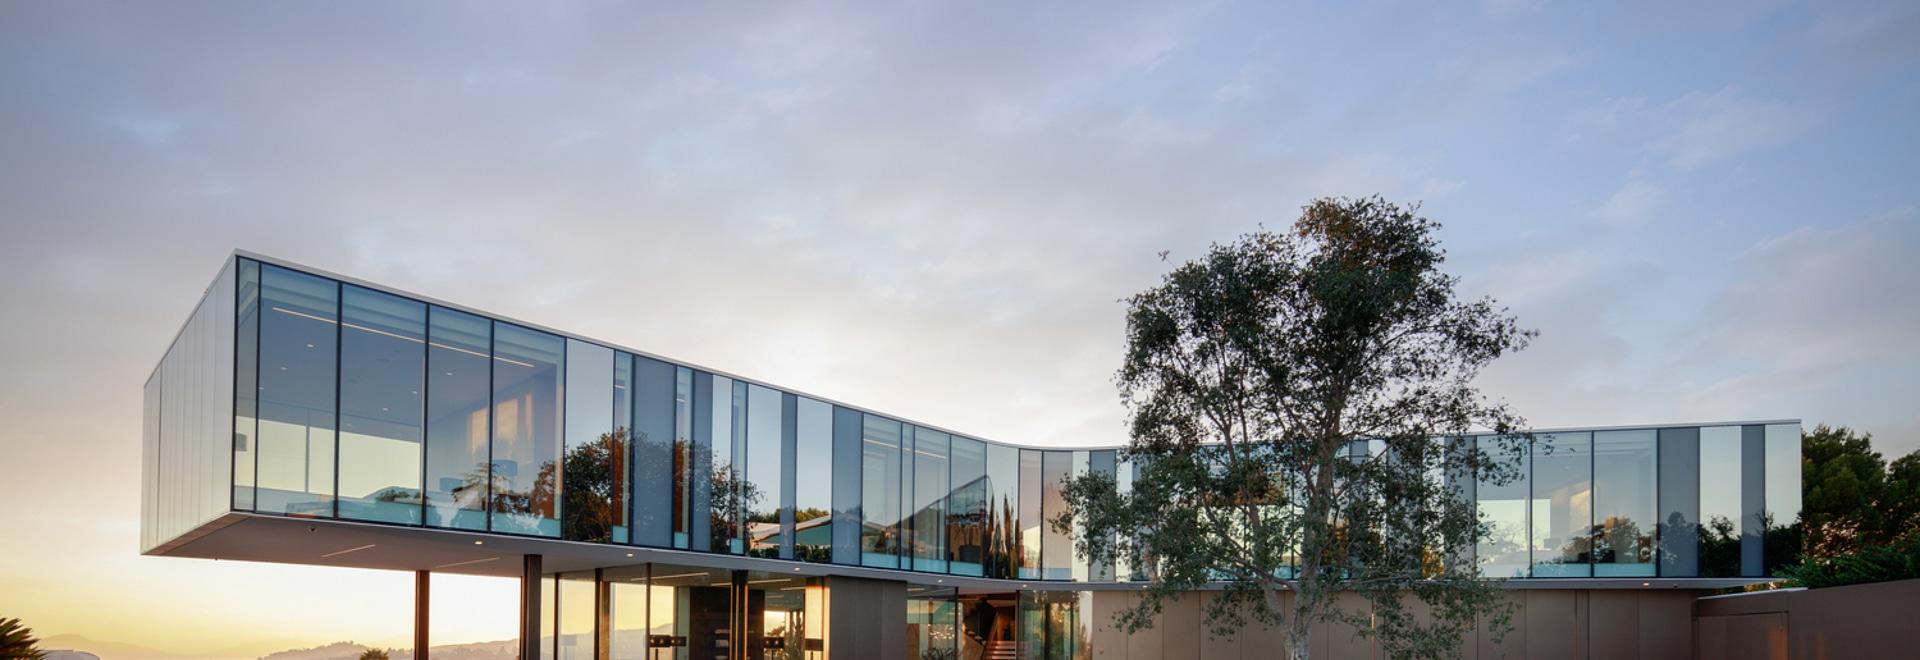 Résidence d'Orum/SPF : architectes